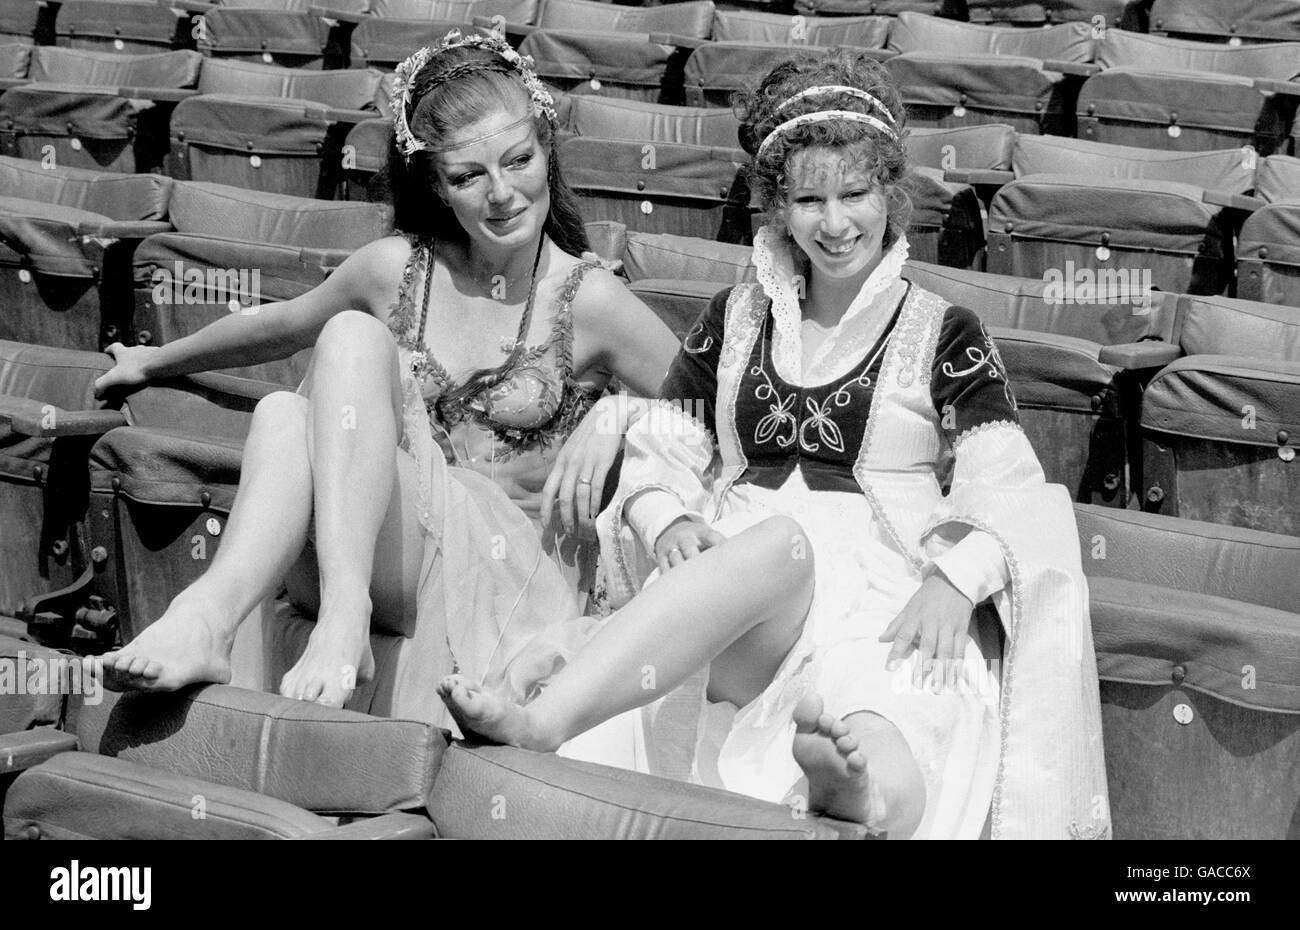 Yvonne Elliman,Louise Caire Clark XXX photos Bonita Granville,Betty Huntley-Wright